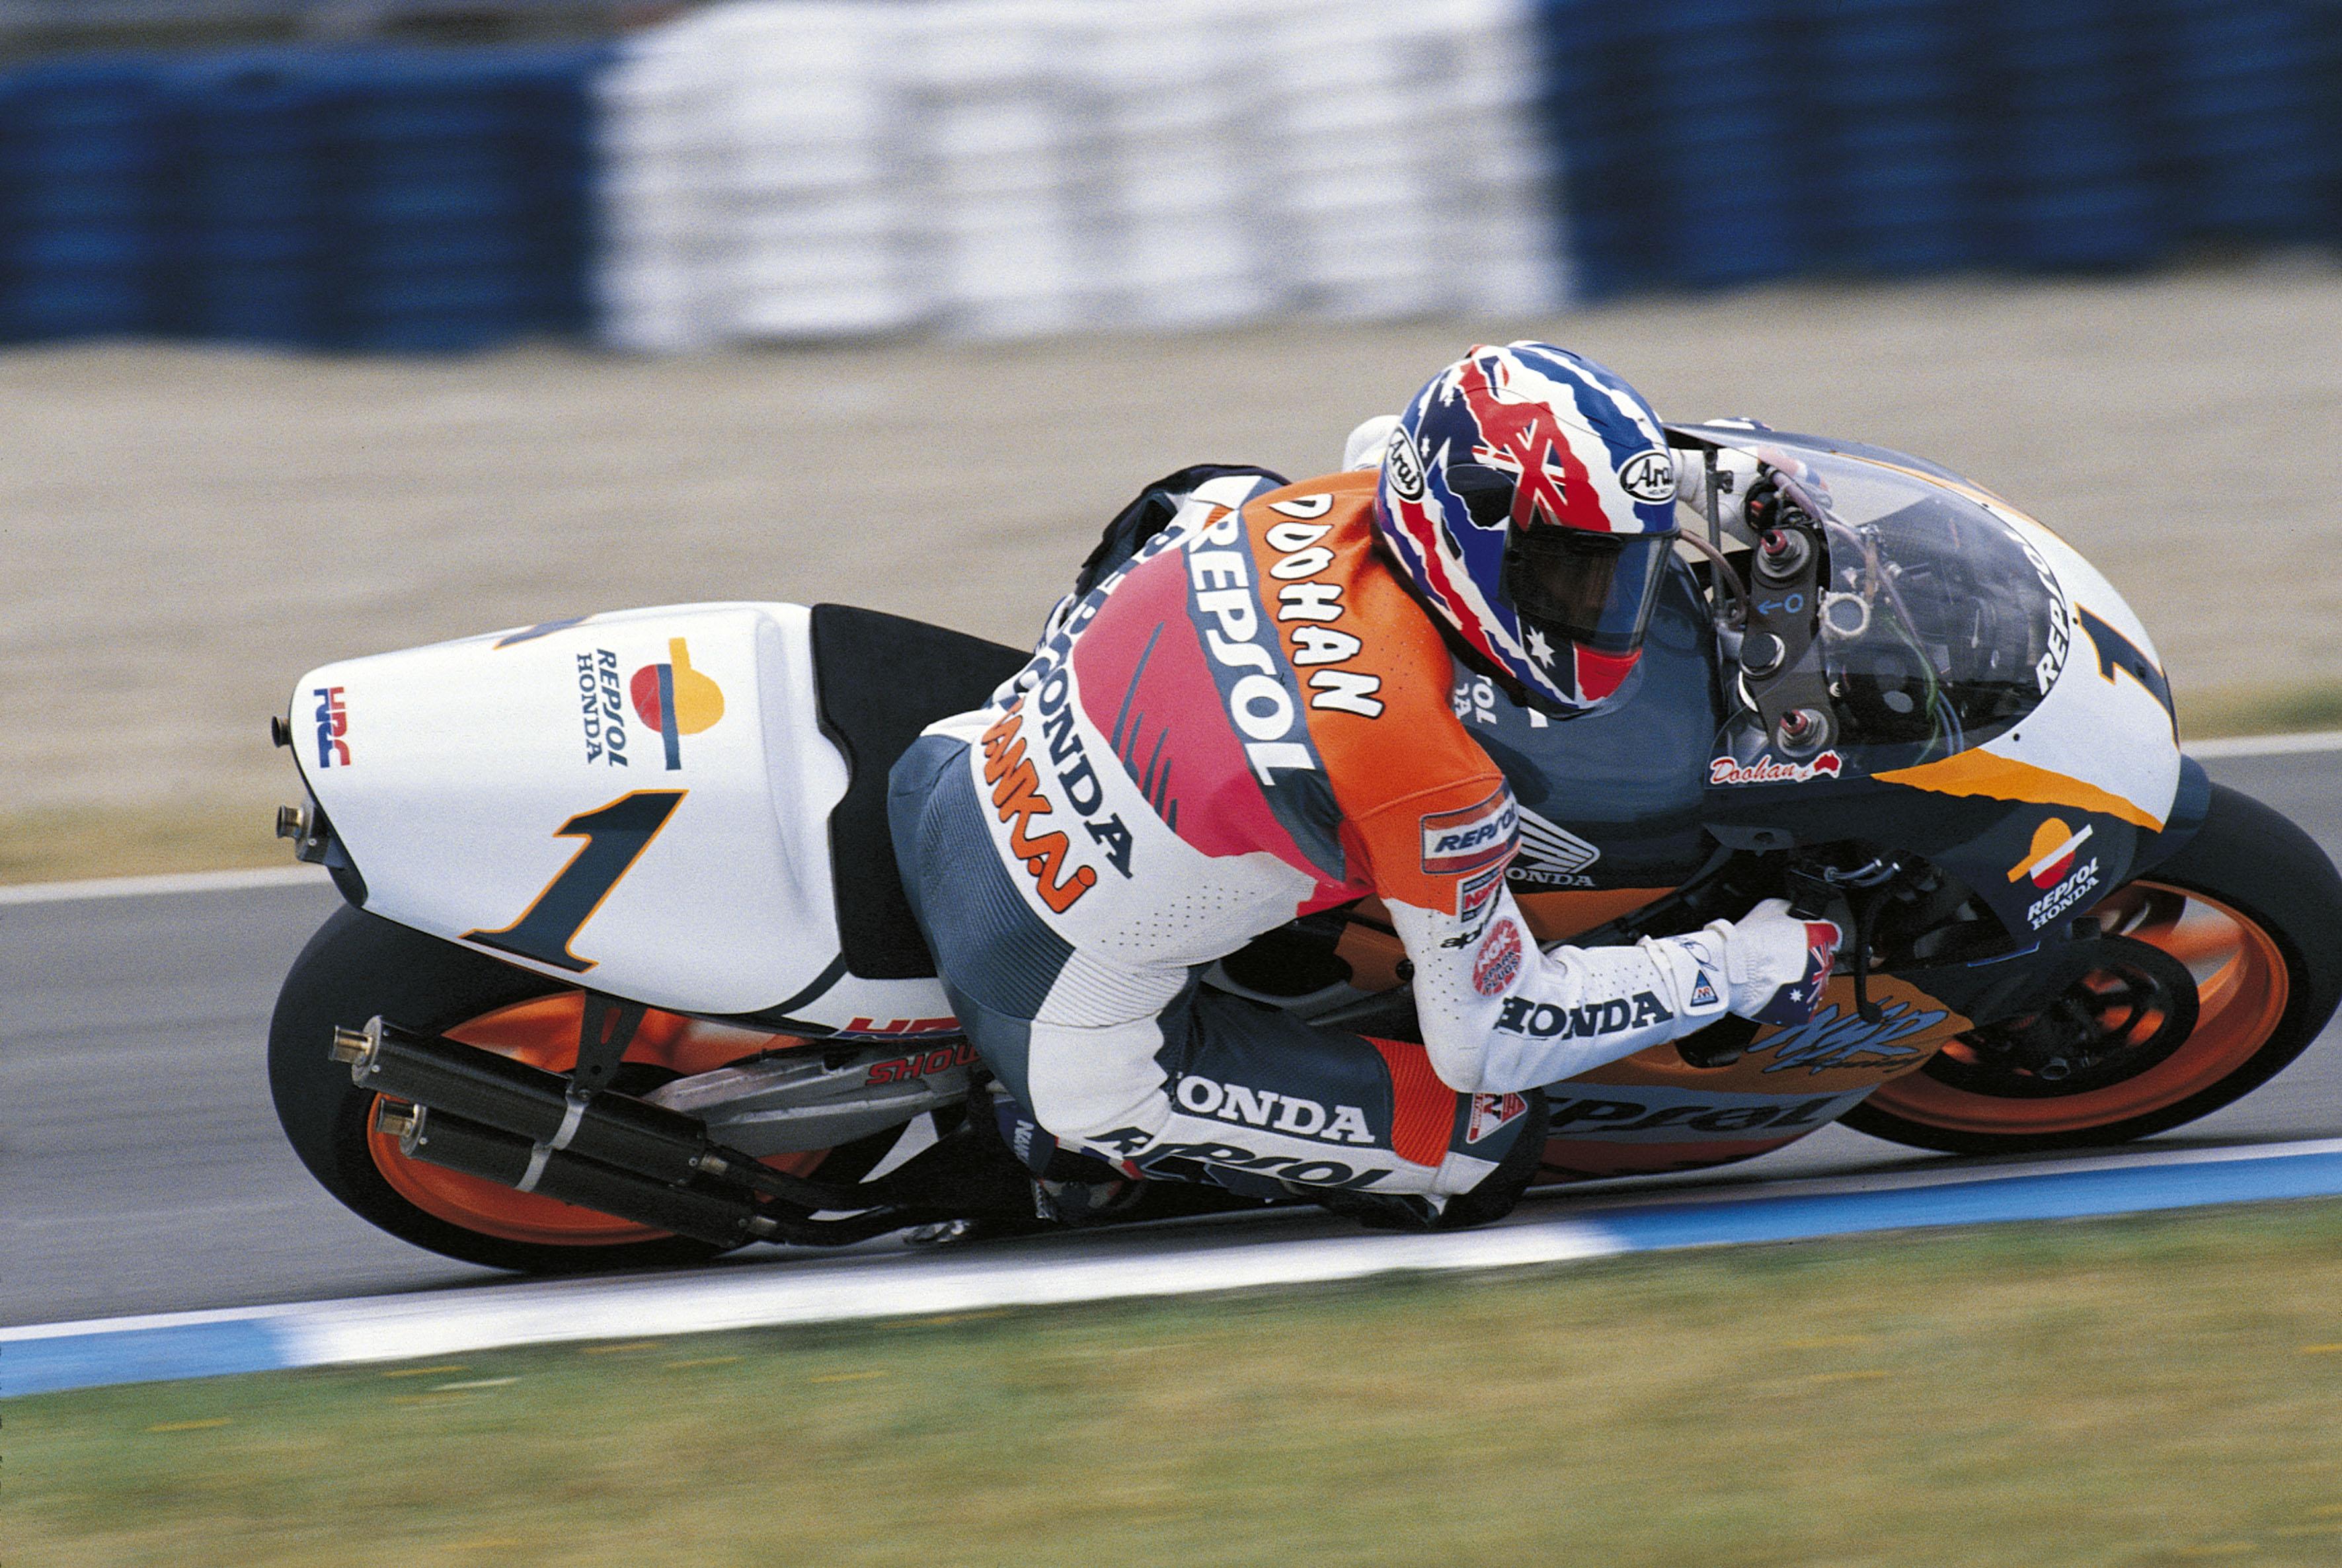 MotoGP: Repsol and Honda extend MotoGP collaboration through to 2017   CircuitProDigital